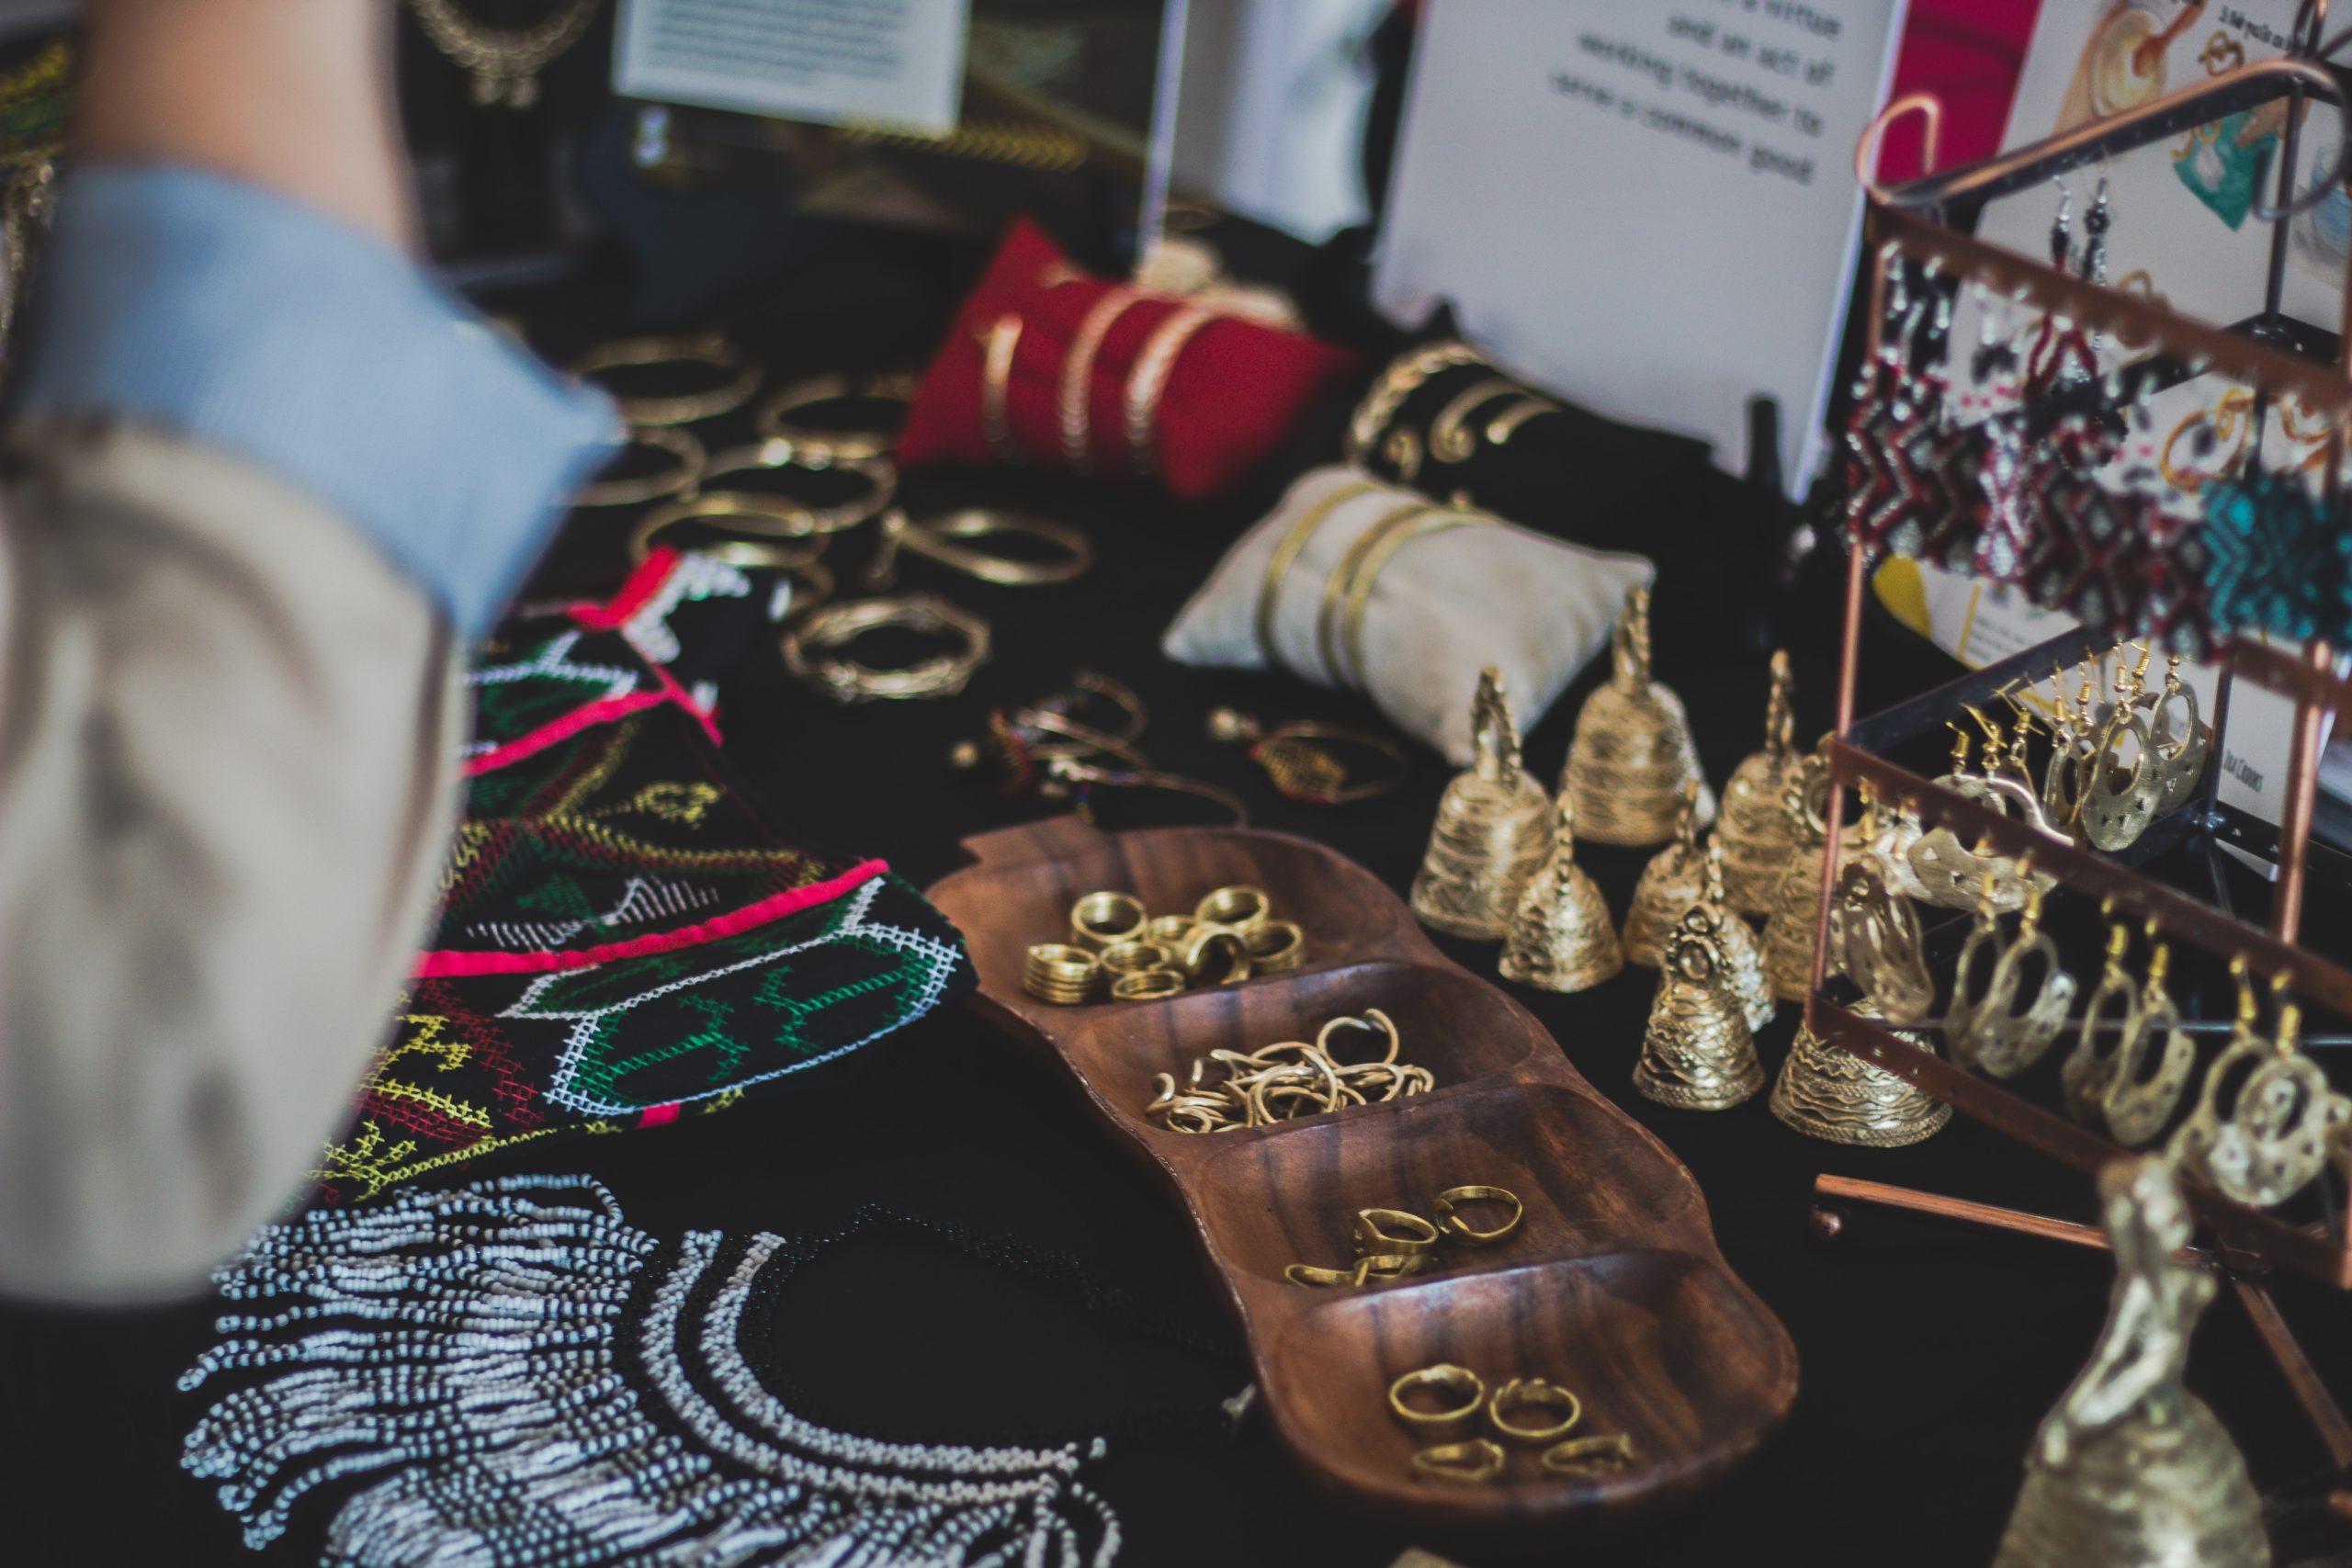 Earrings As DIY Gift Ideas